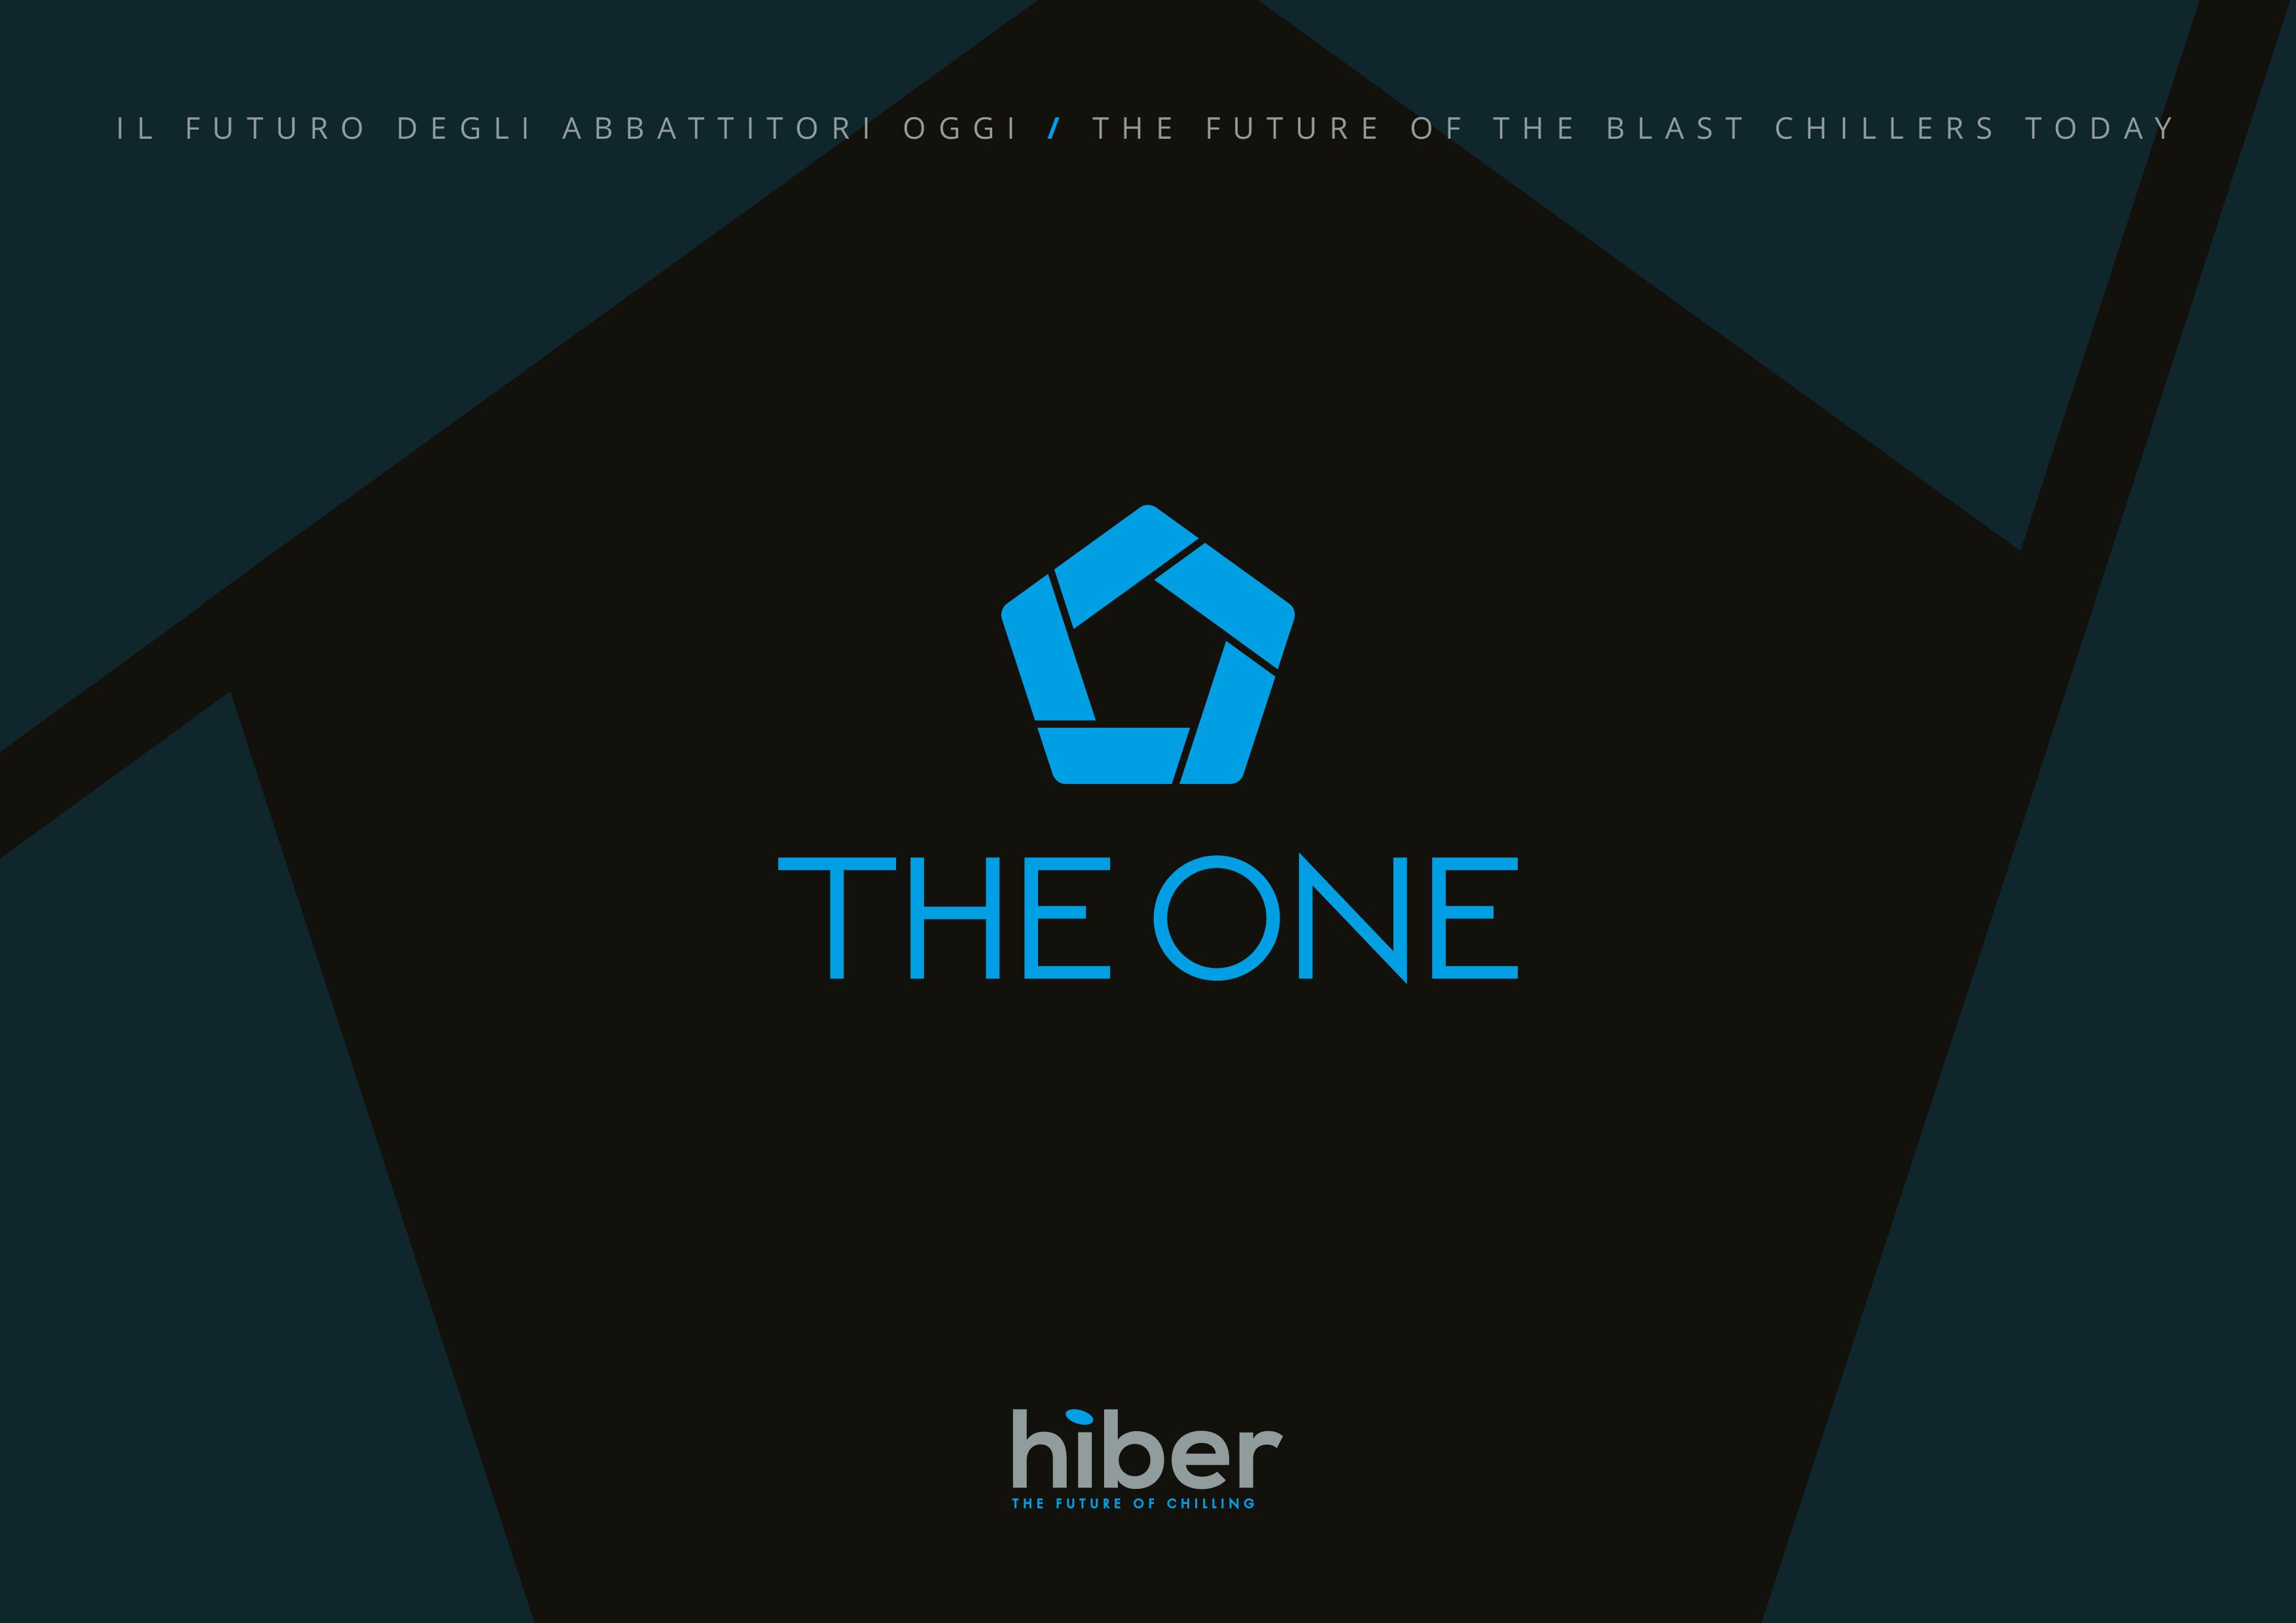 Hiber – The One